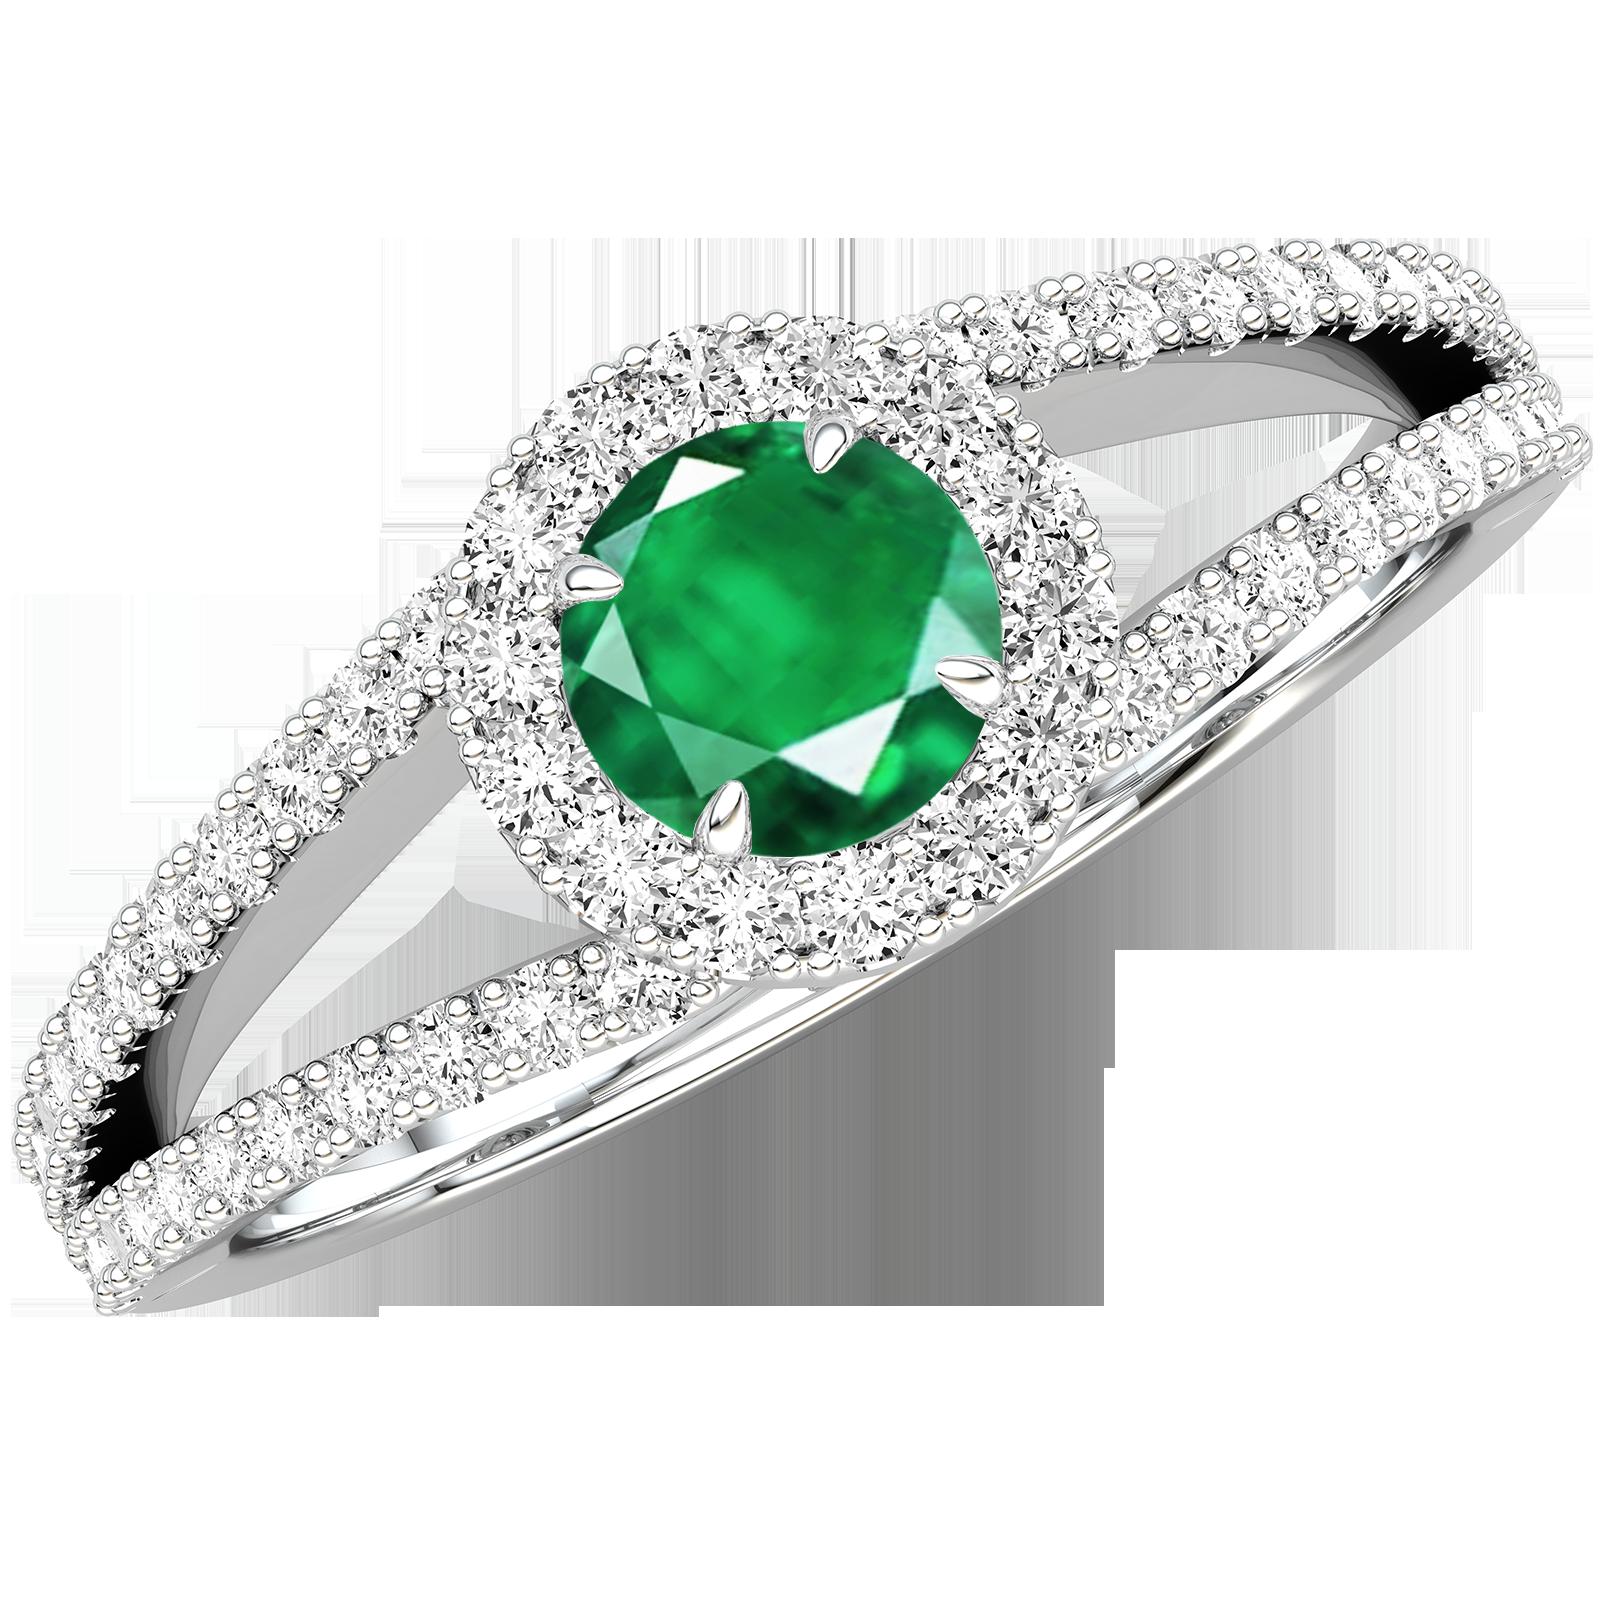 RDM667W-Inel cu Smarald si Diamante Dama Aur Alb 18kt cu un Smarald Rotund Briliant Central si Diamante Mici pe Laterale-img1